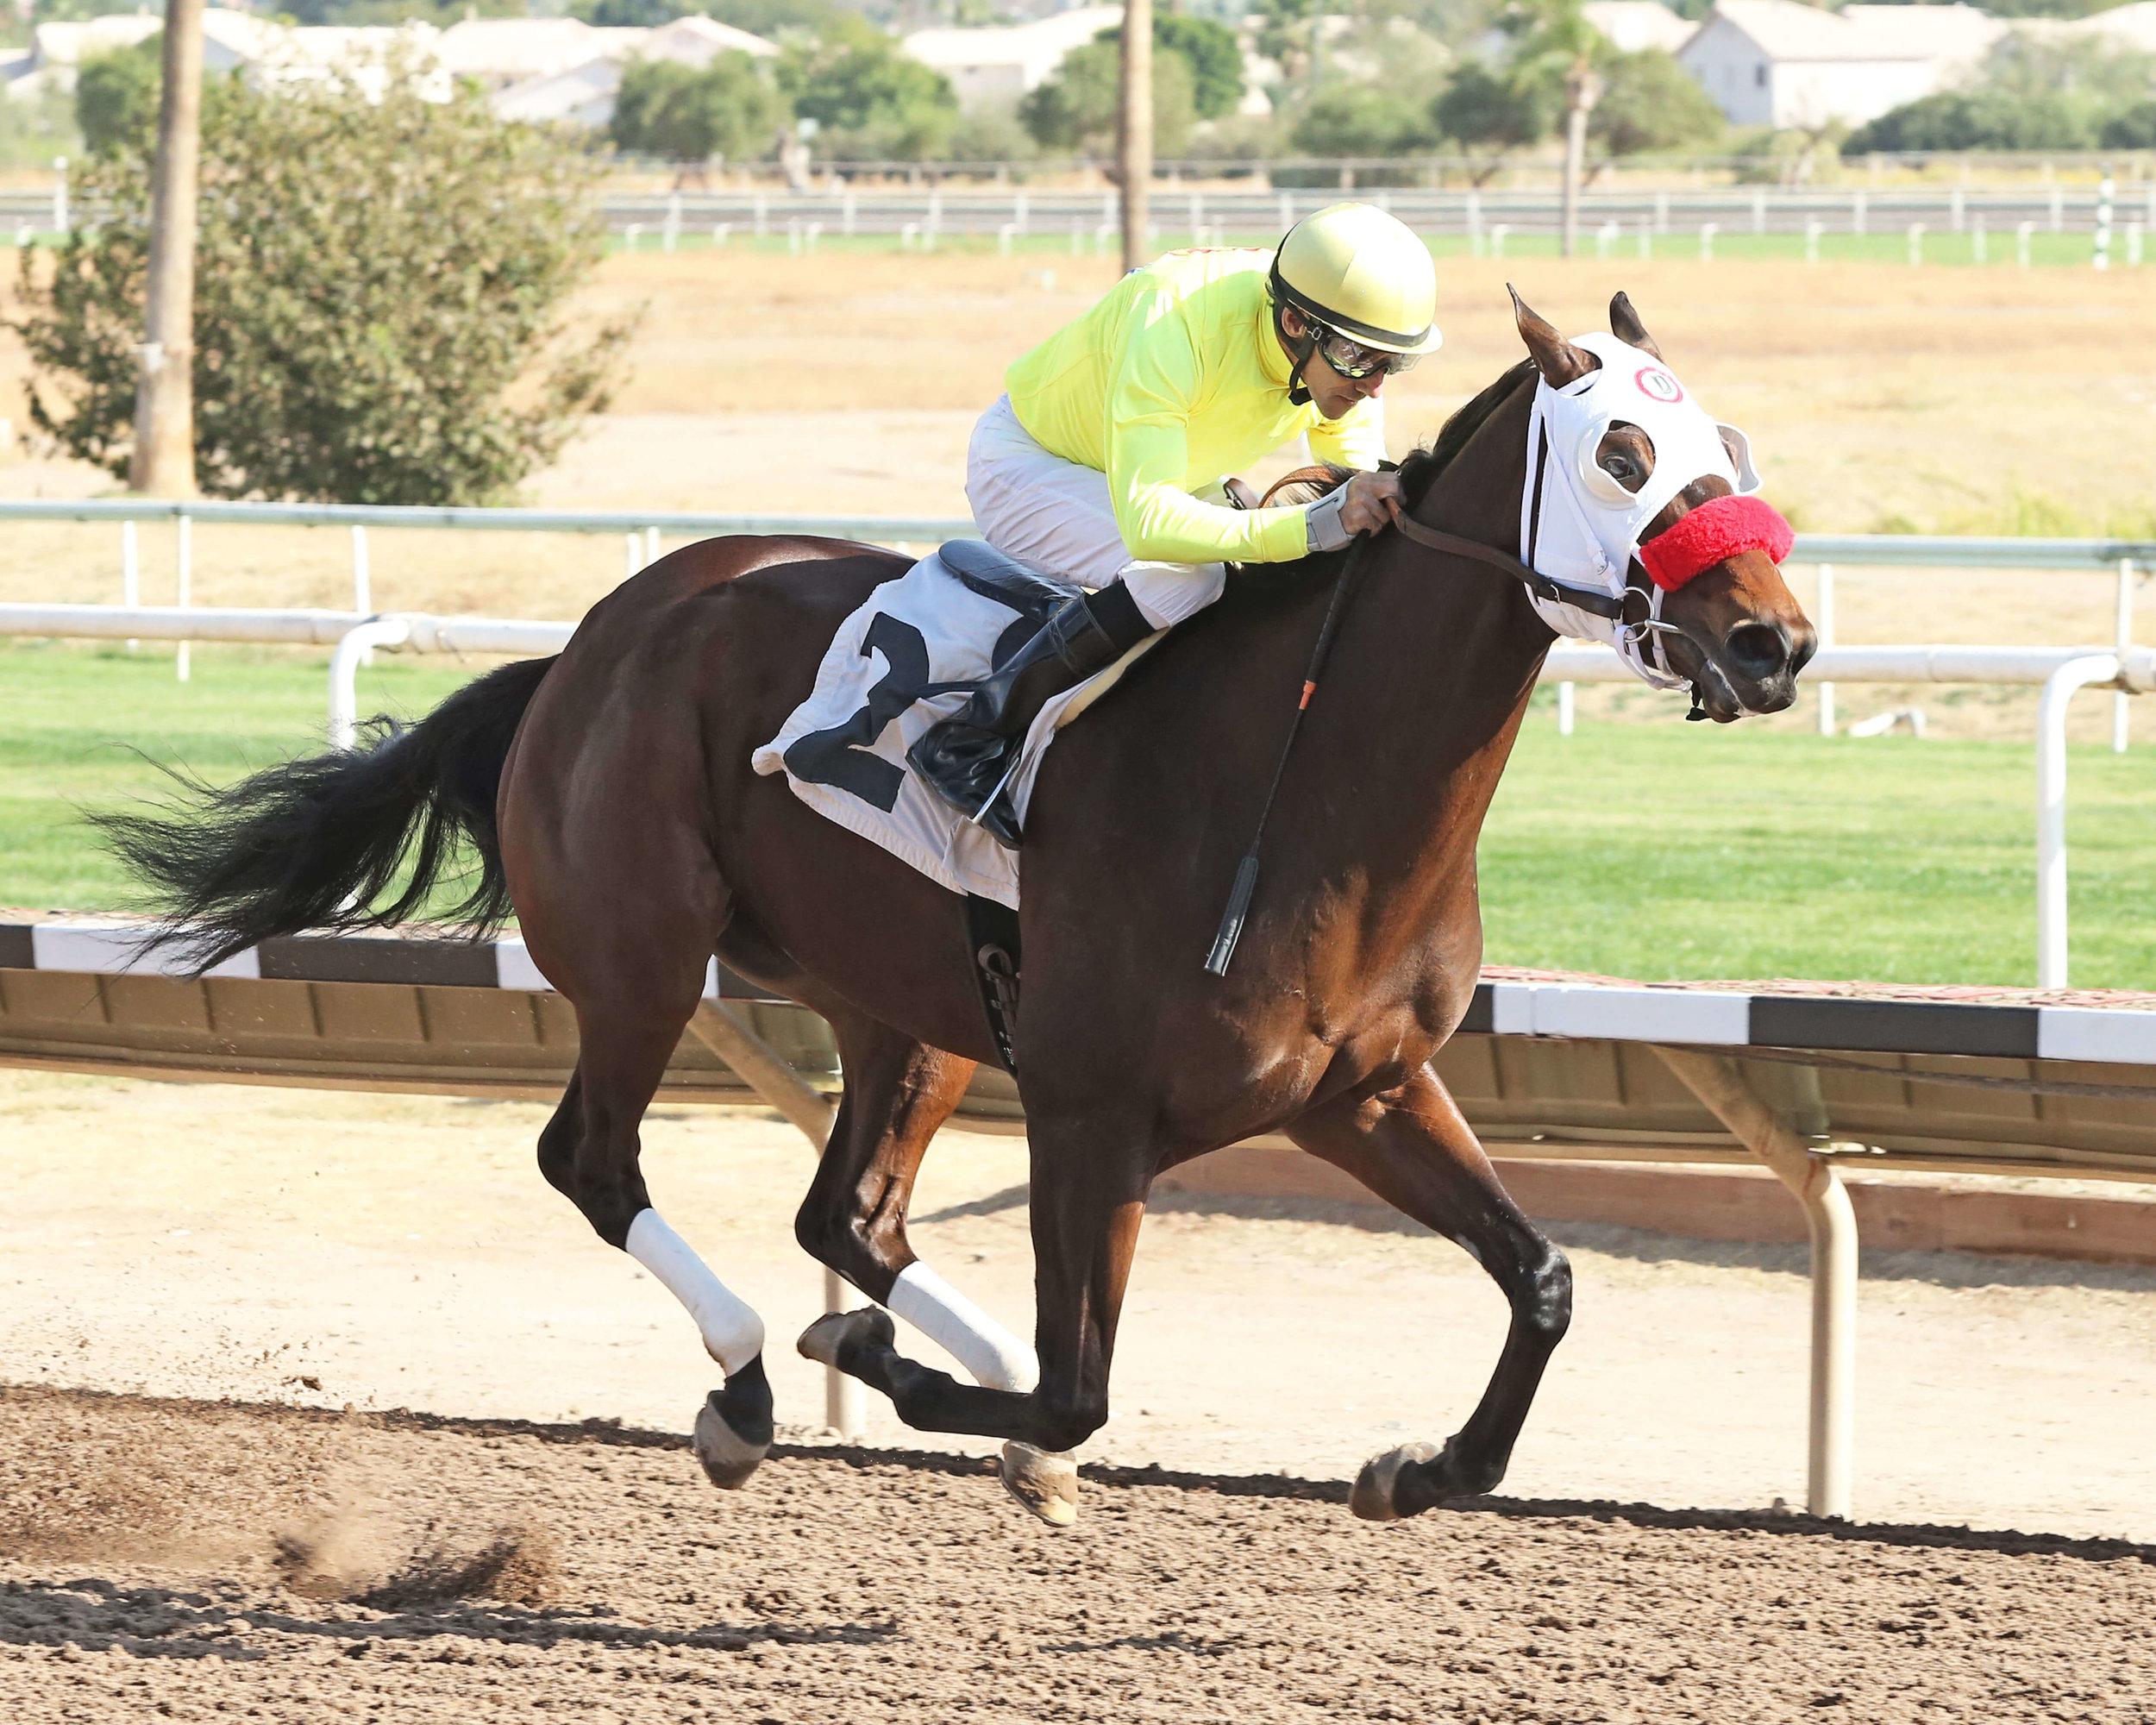 Omar - Caballos Del Sol Stakes - 11-15-14 - R03 - TUP - Finish (1).jpg